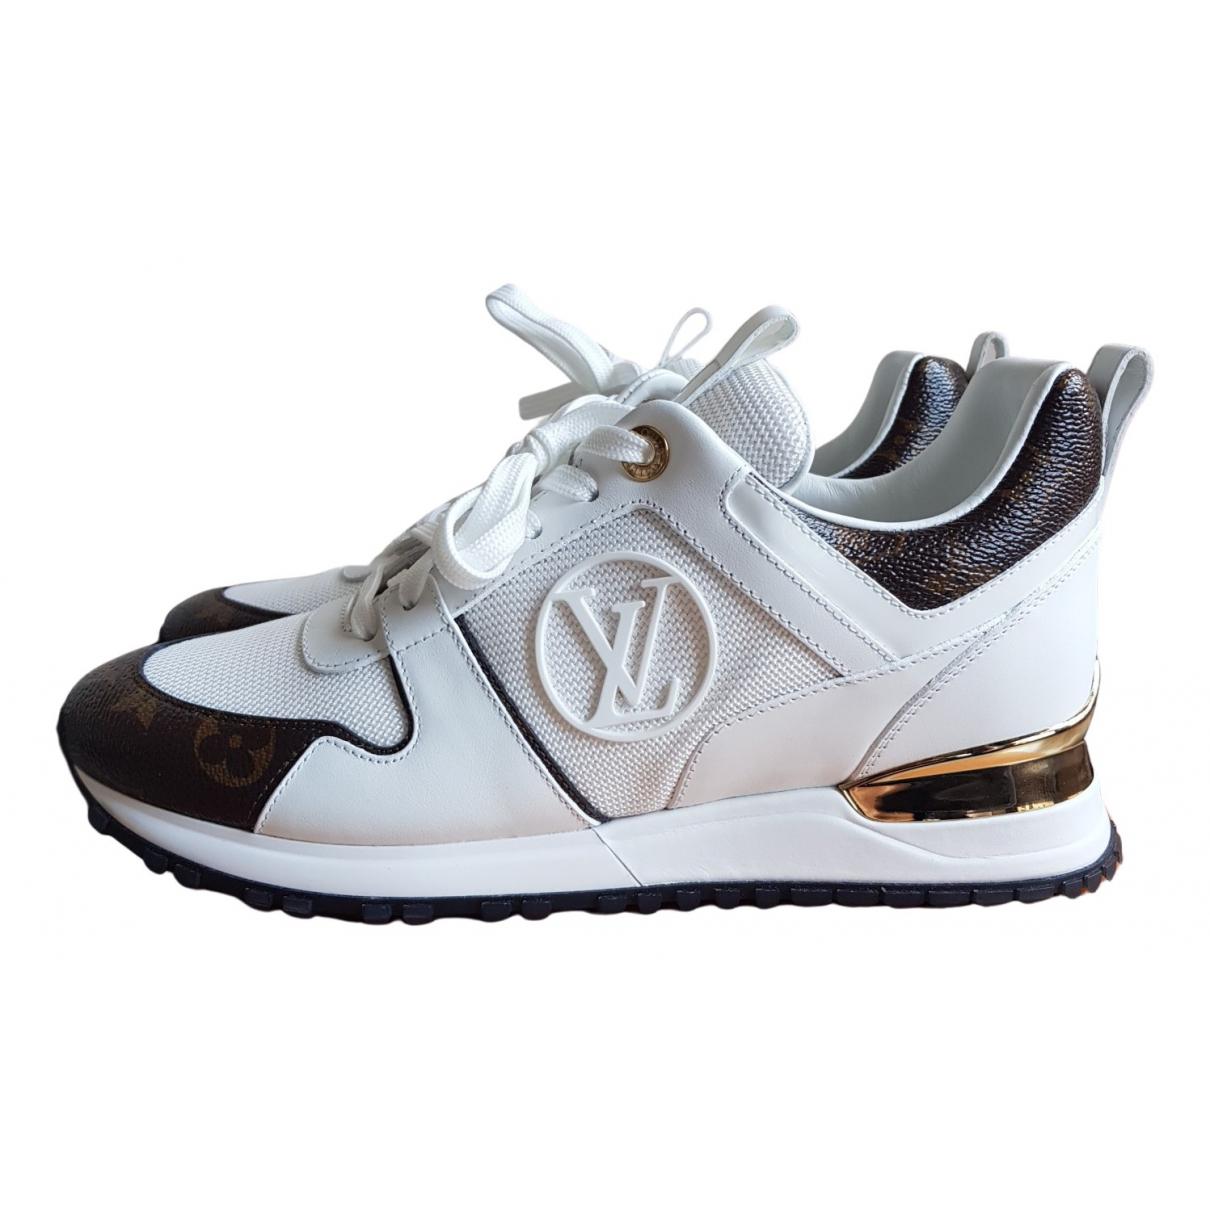 Louis Vuitton - Baskets Run Away pour femme en cuir - blanc